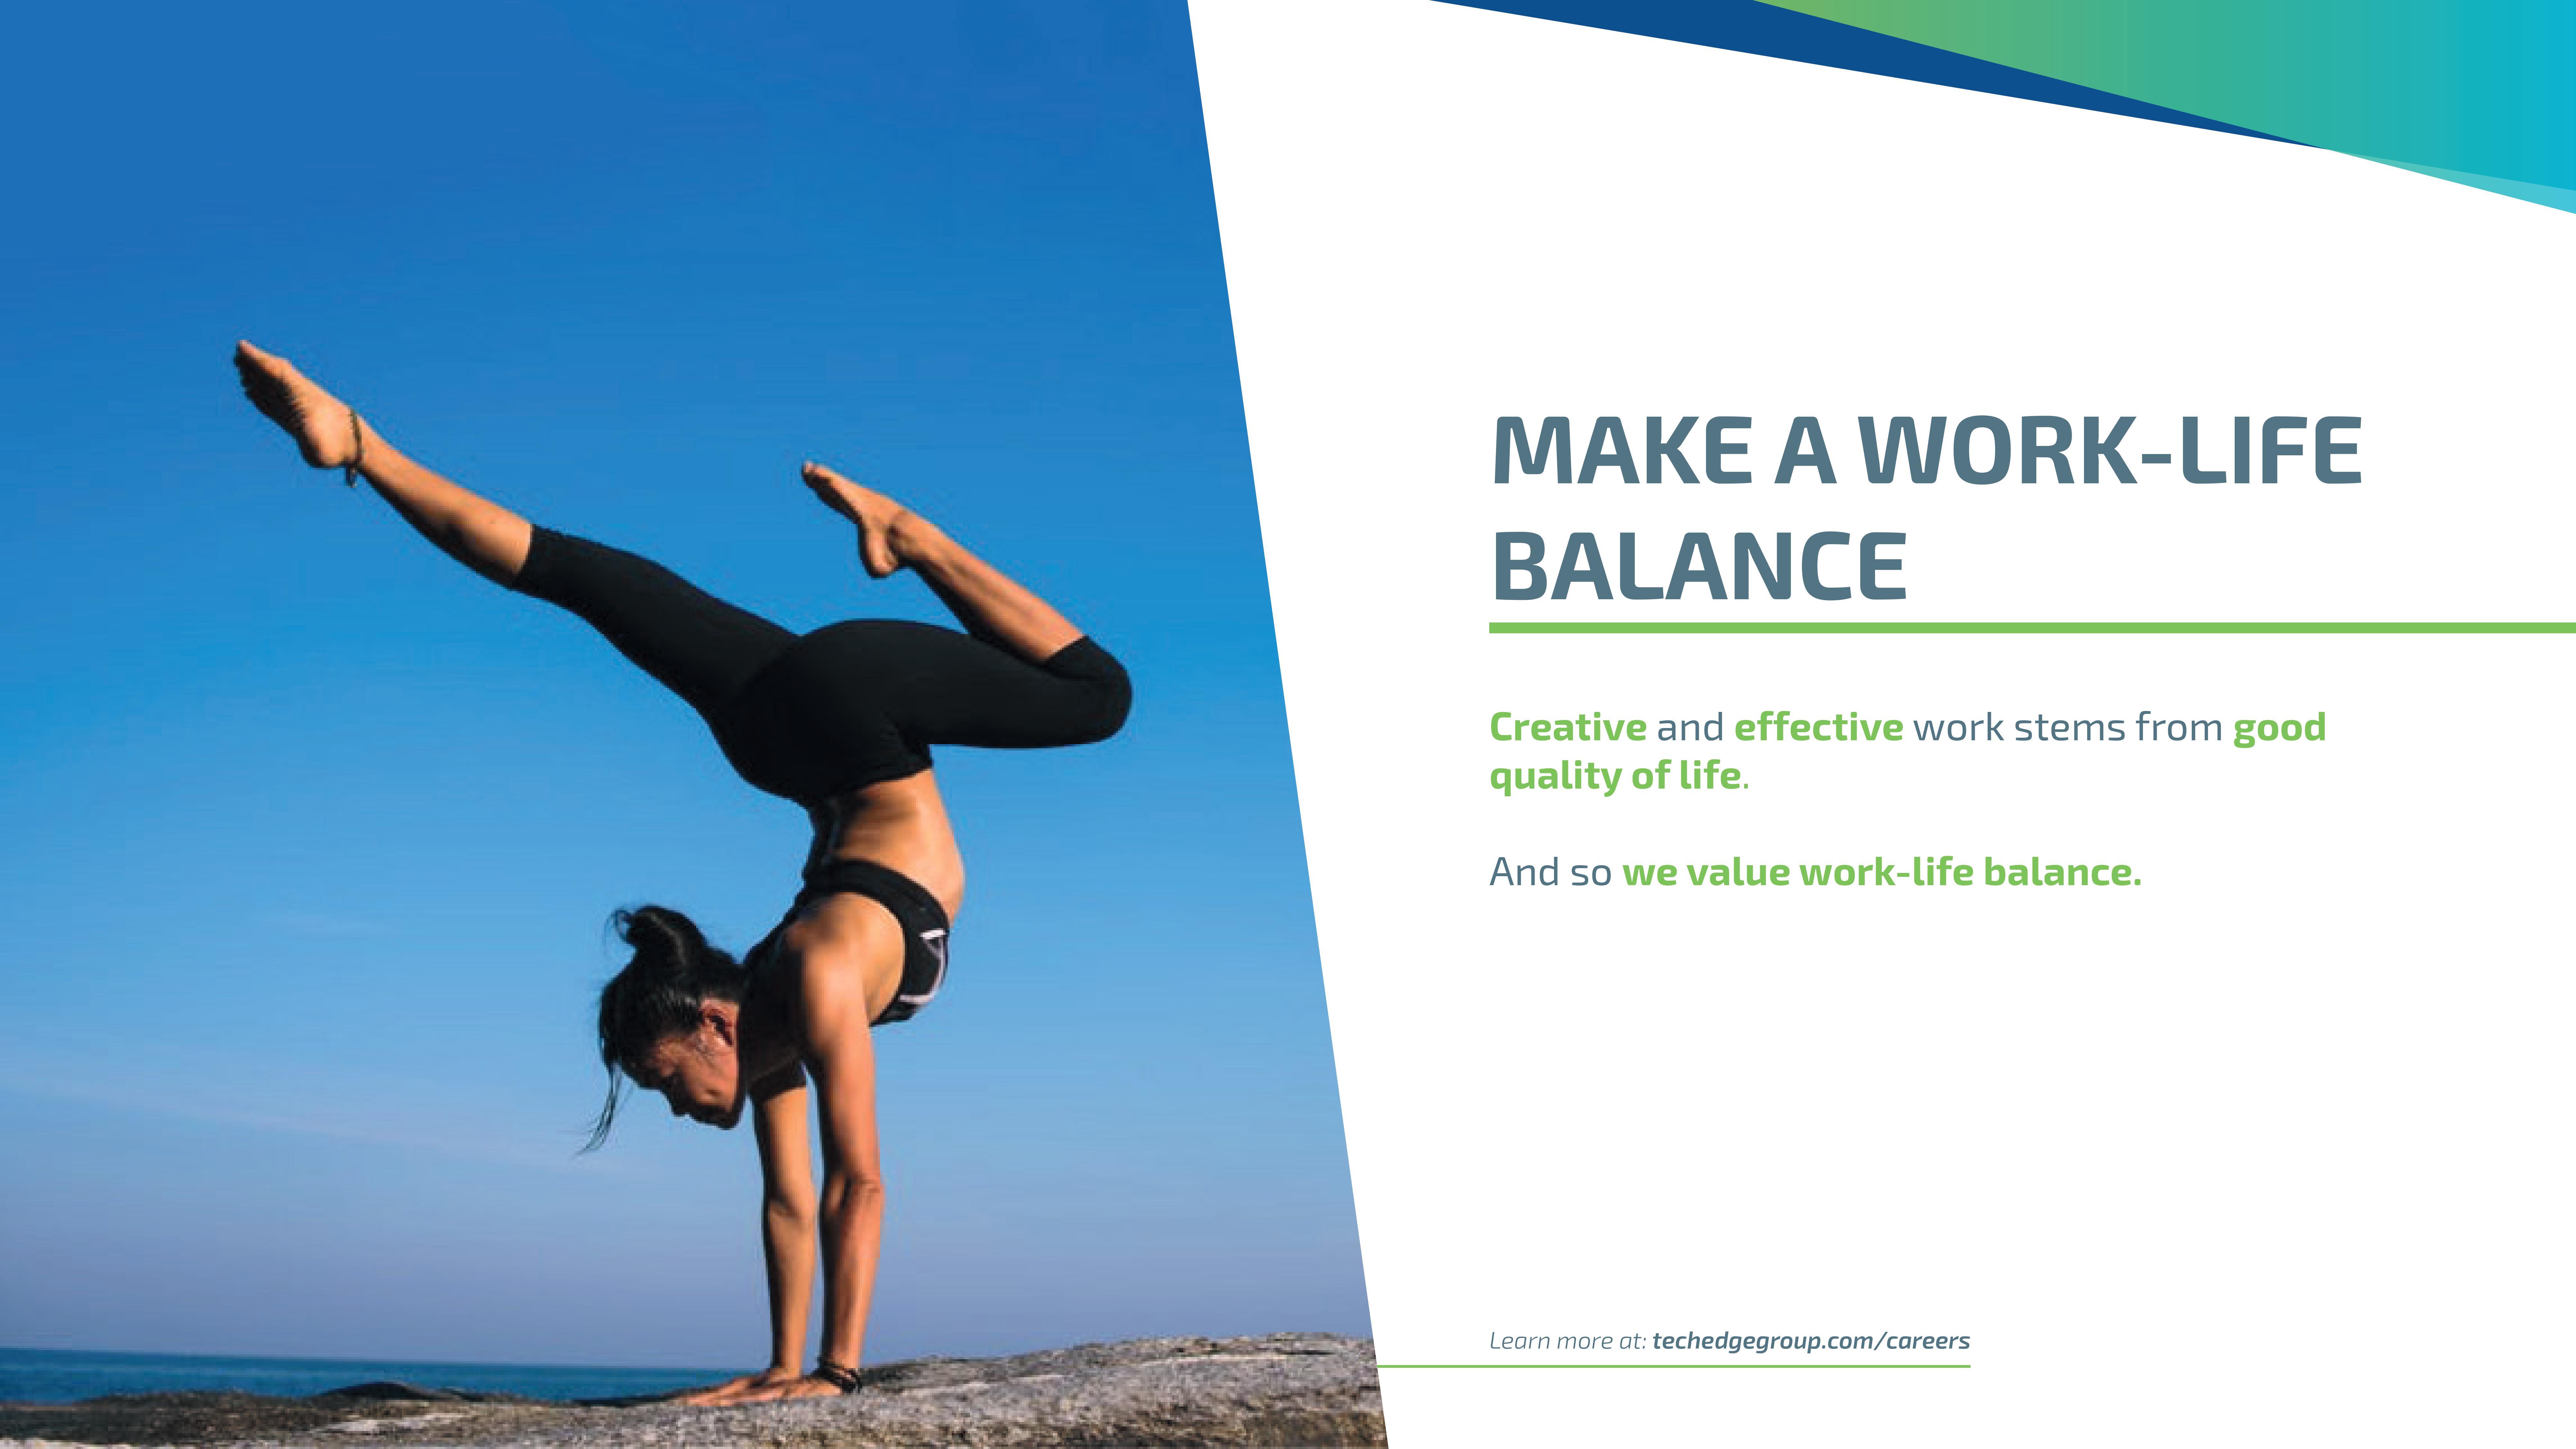 Make a work/life balance